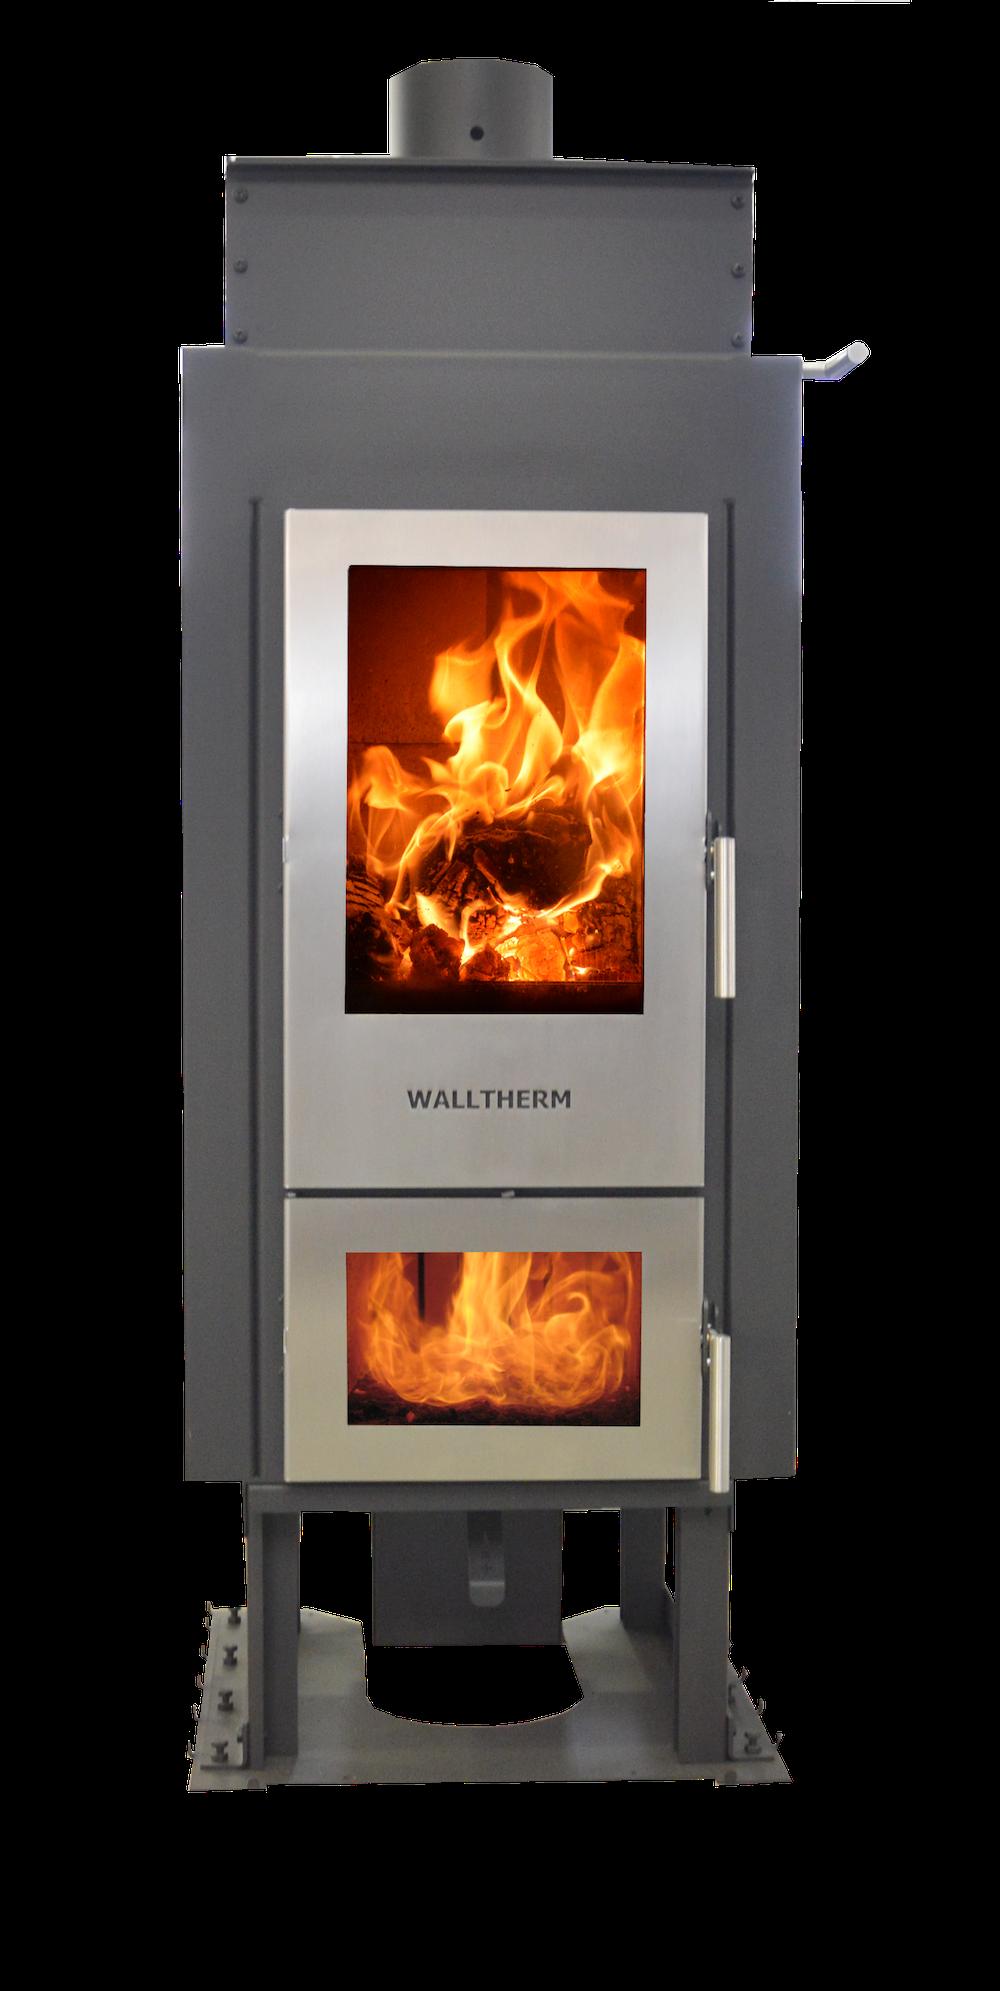 Eco2all Walltherm Vajolet Basic inbouw CV-houtvergasserkachel